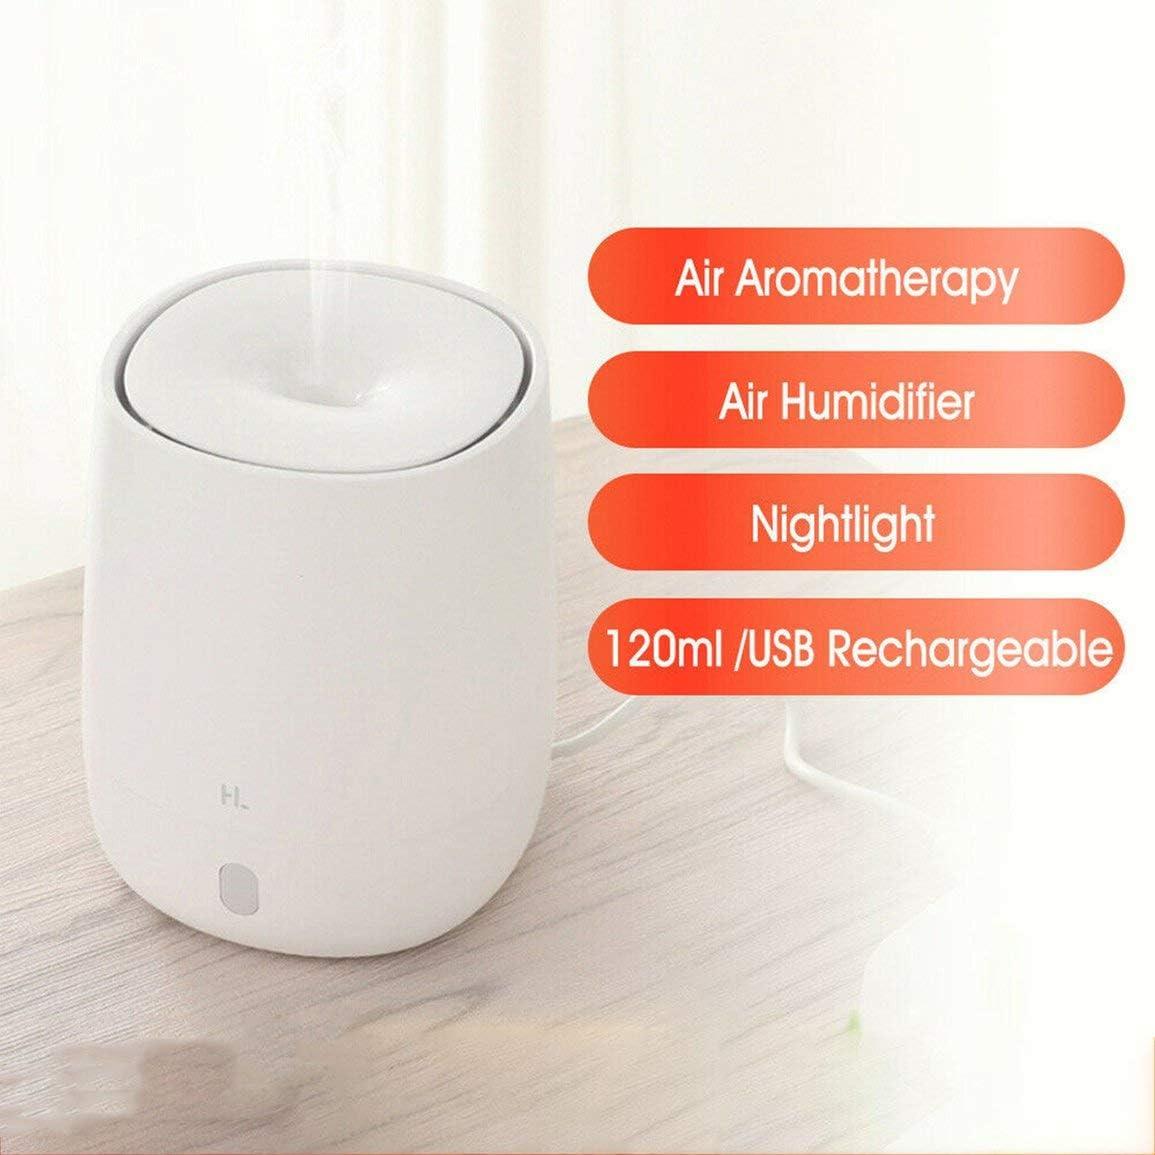 Justdodo Xiaomi Mijia Youpin HL USB port/átil Mini difusor de aromaterapia humidificador humidificador de Aroma silencioso